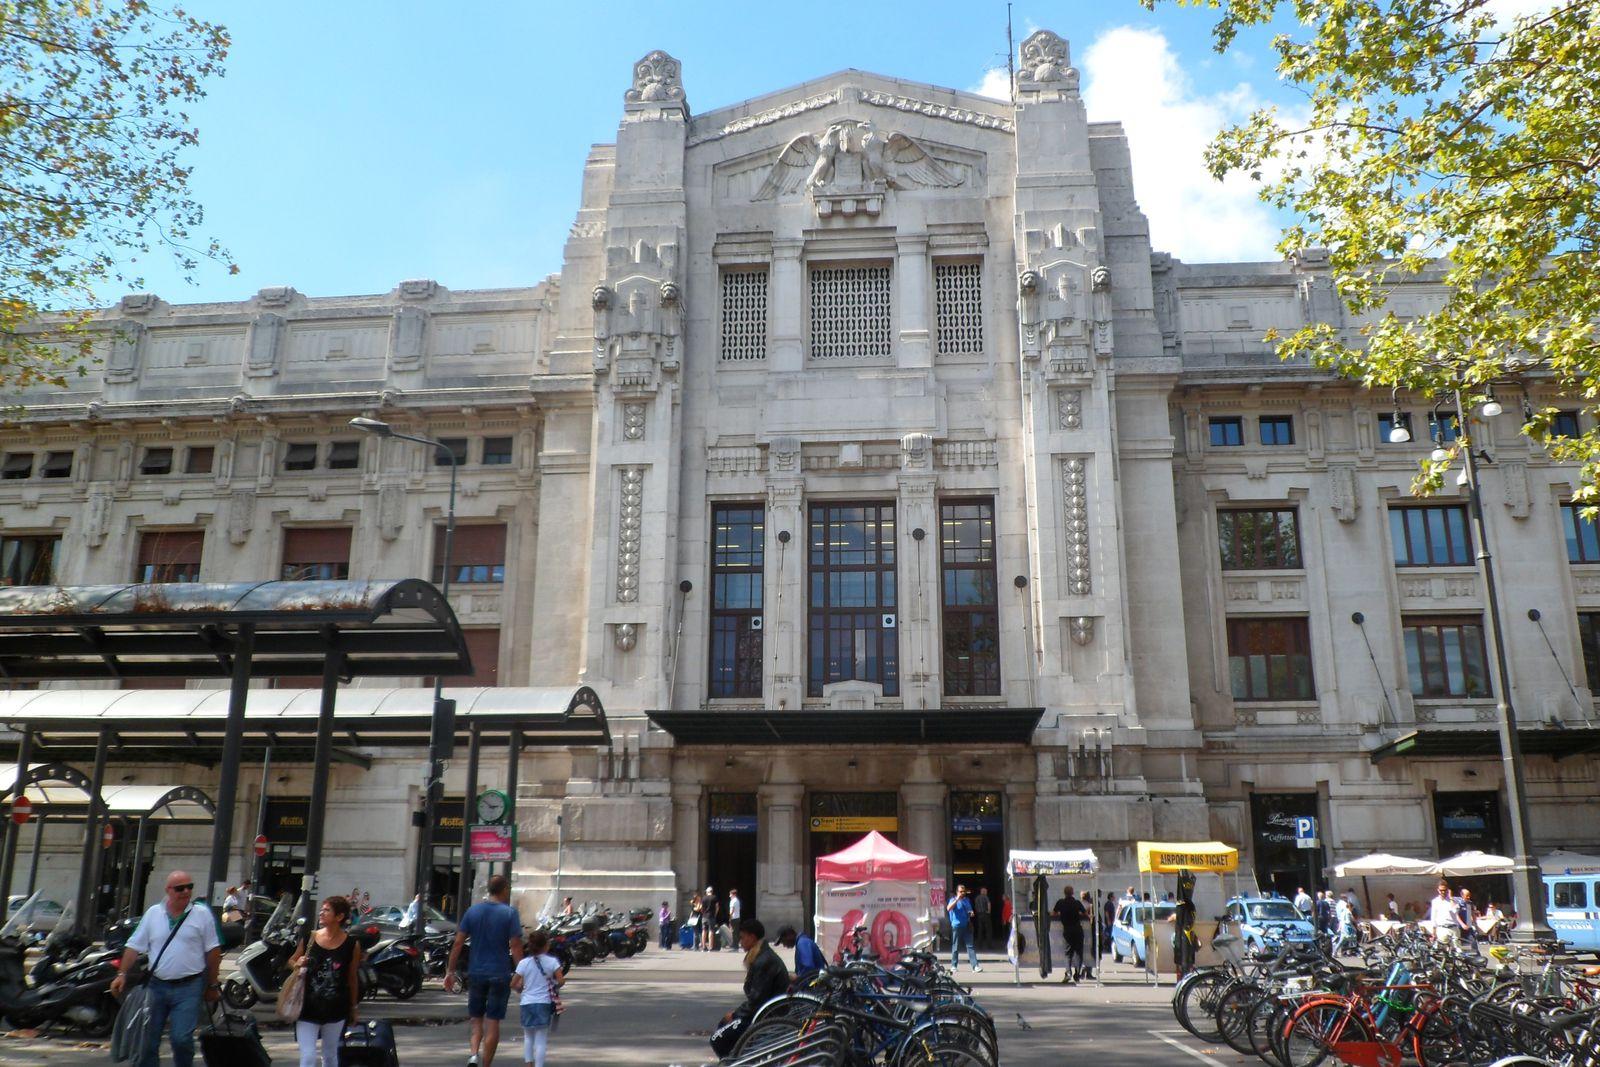 la façade de la gare de milan, hénaurme, dans toute sa grandiloquence mussolinienne